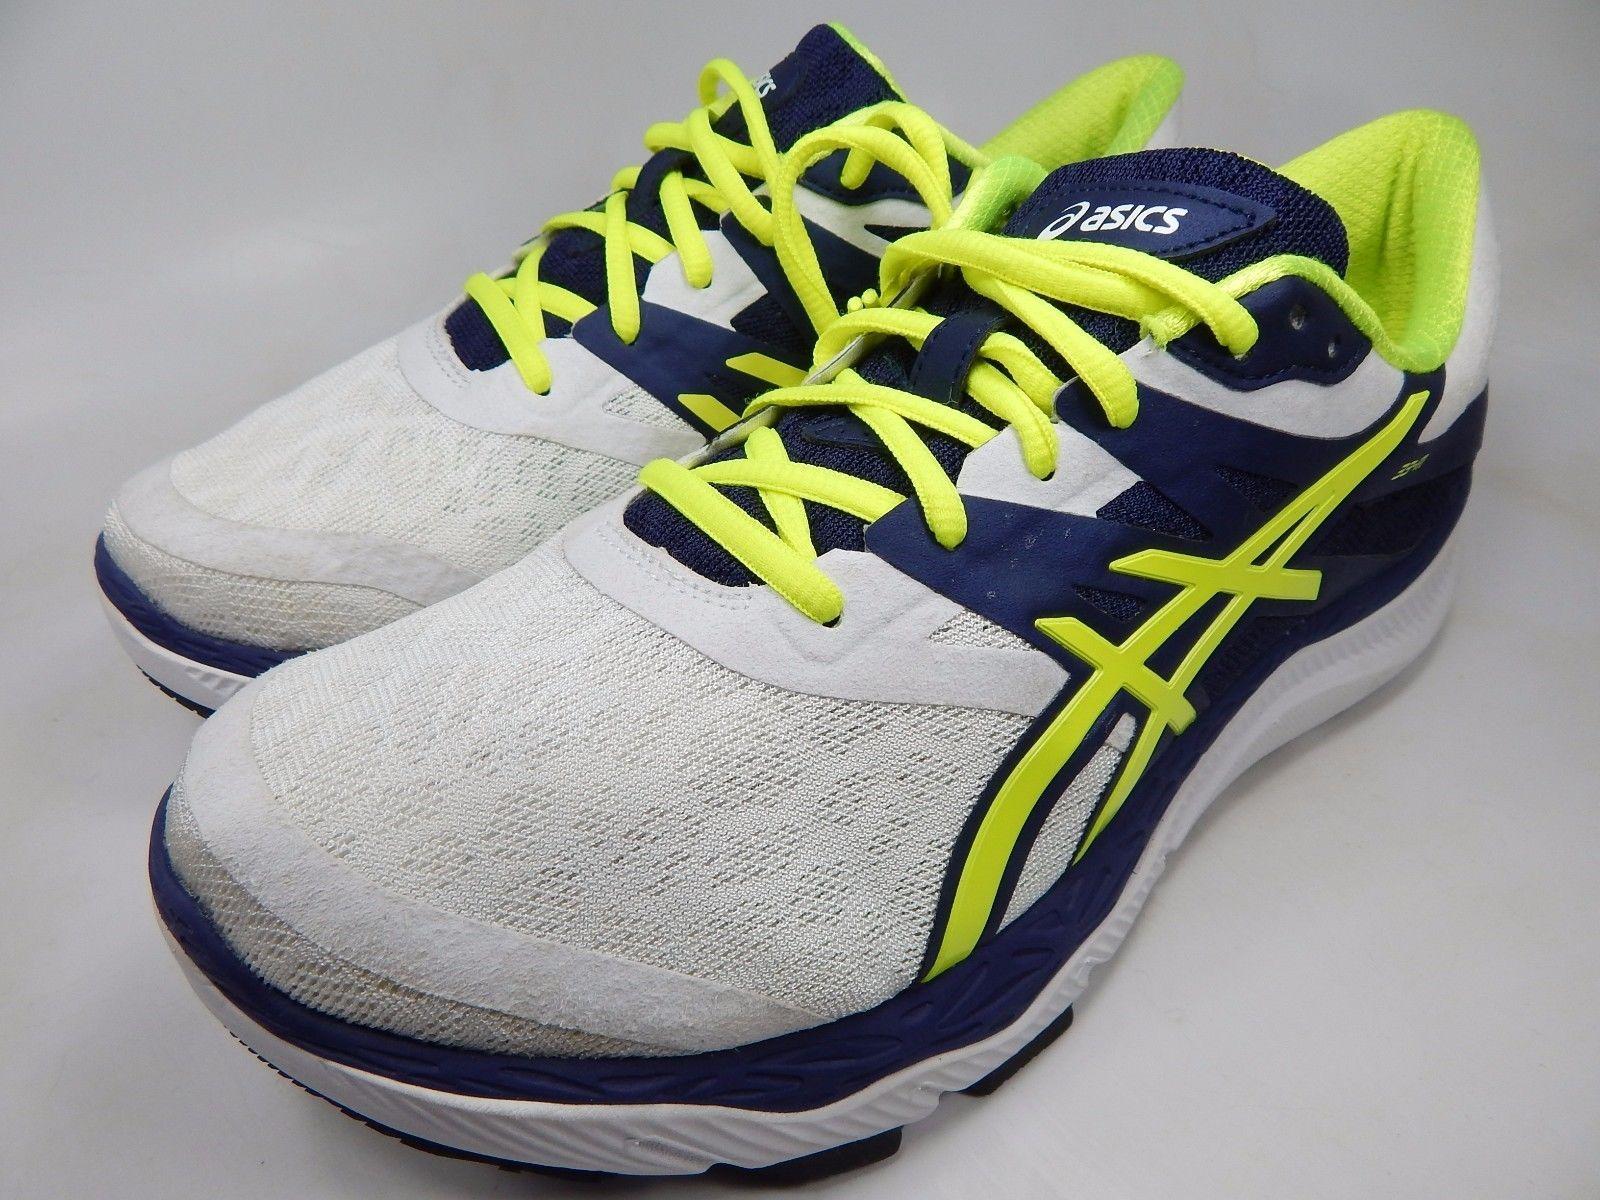 Asics 33-M Men's Running Shoes Size US 9.5 M (D) EU 43.5 White T538N